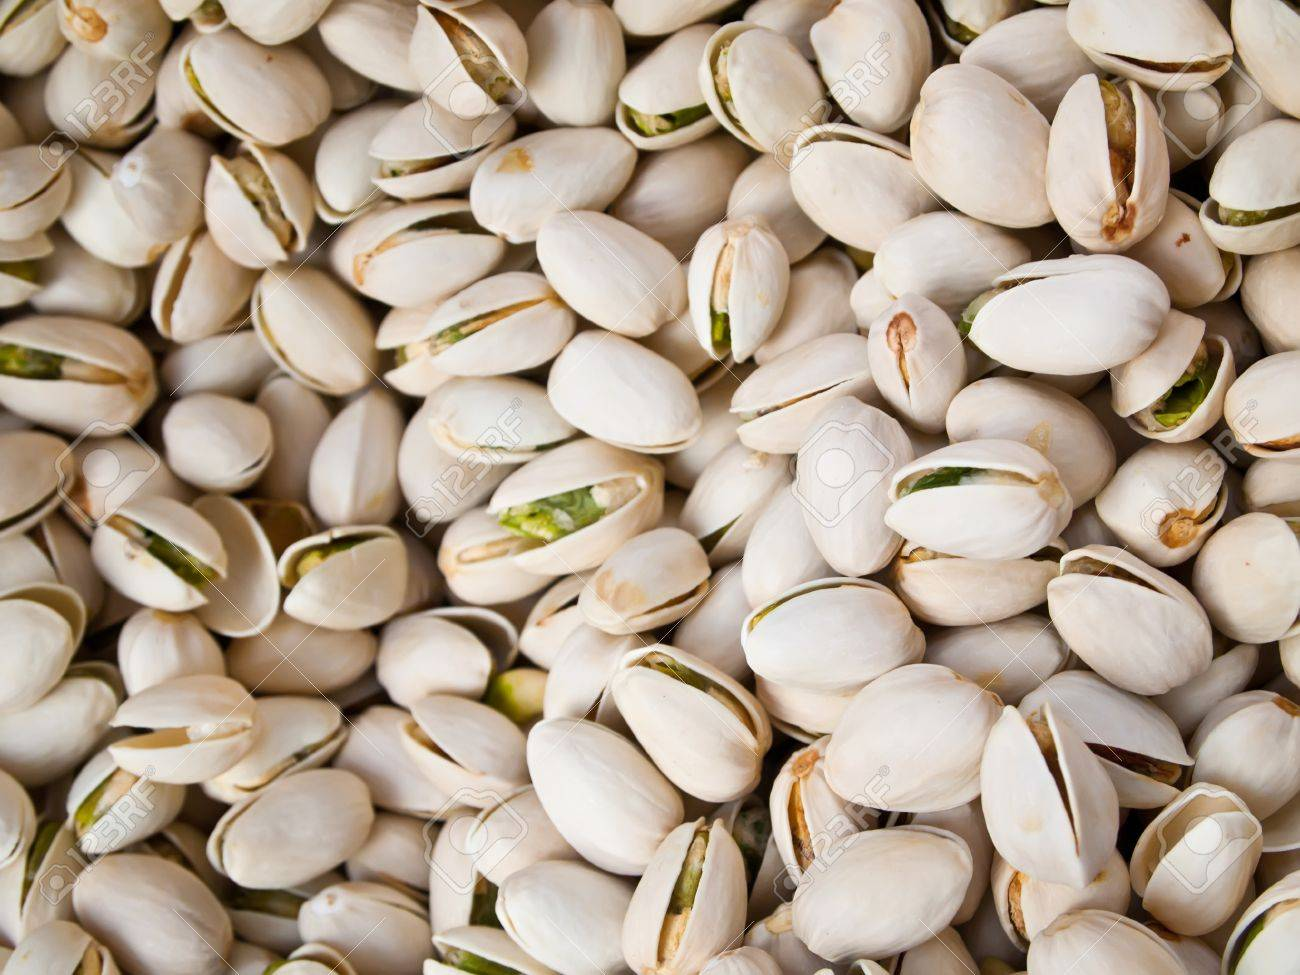 Pistachios Nuts,Cashew Nuts,Almonds,Pine Nuts,Hazel nuts,Mecademmia Nuts